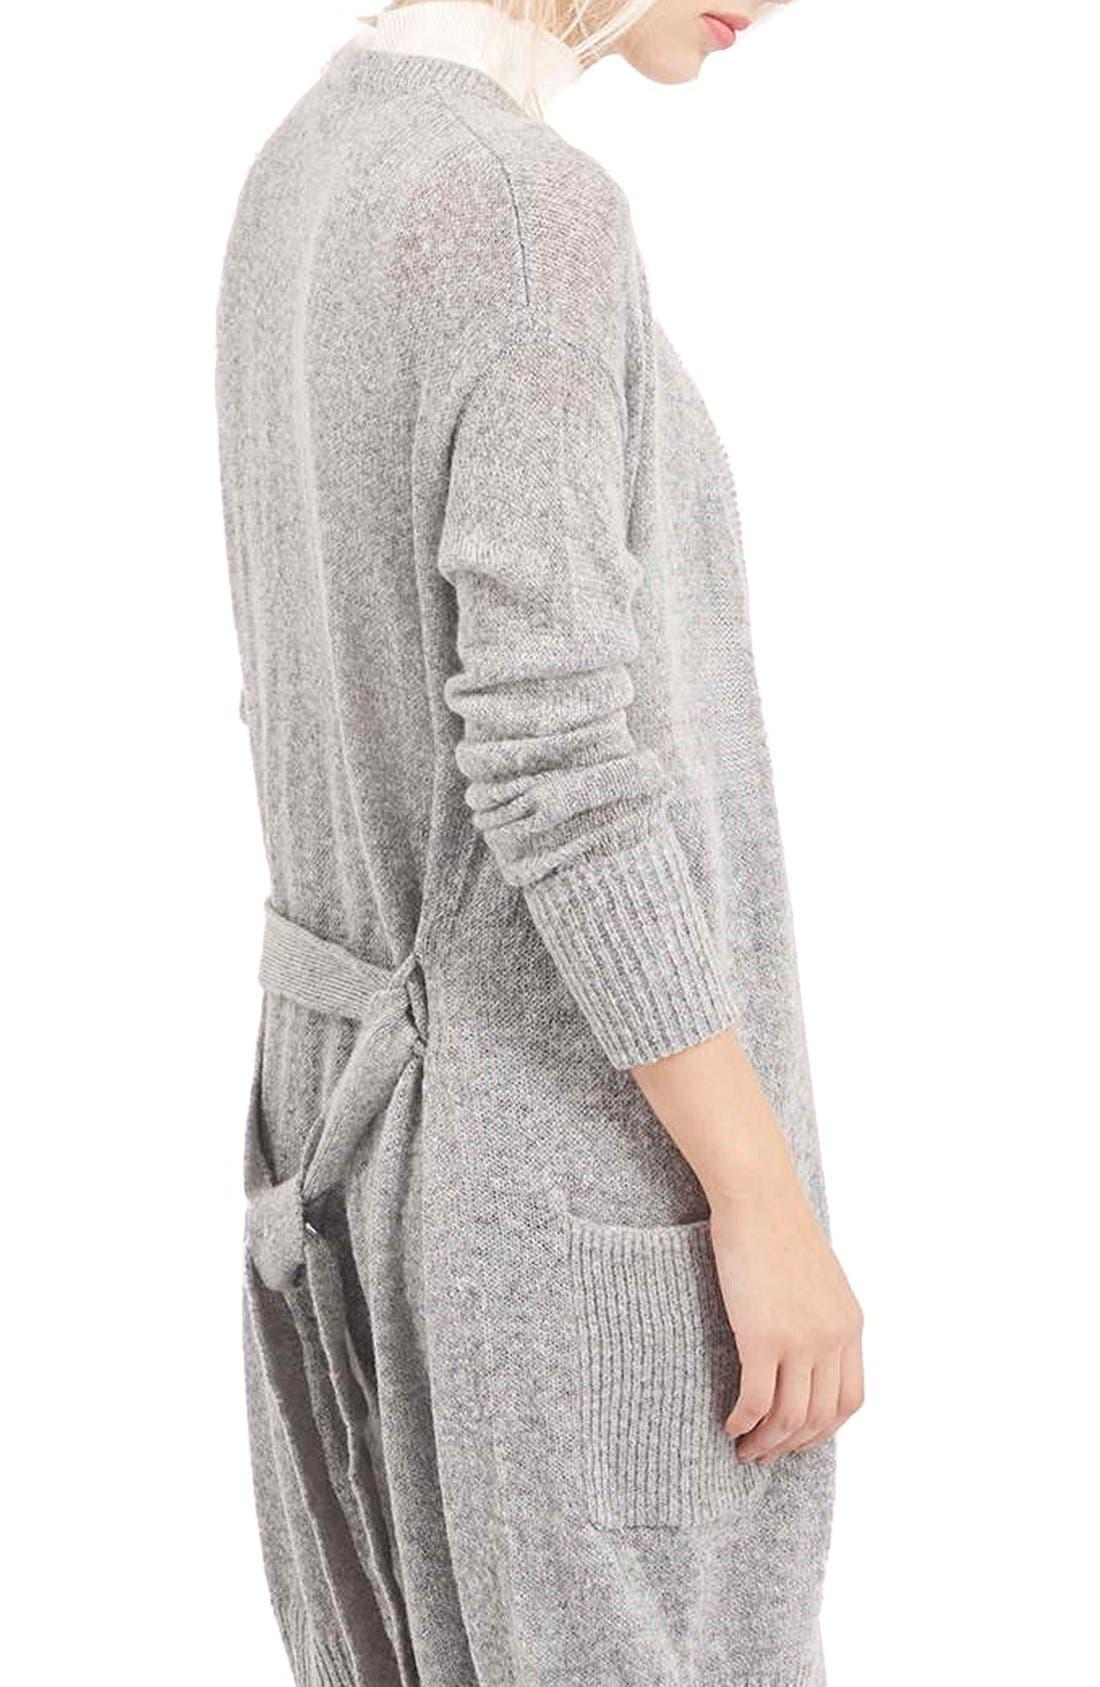 'Lulu' Belted Longline Cardigan,                             Alternate thumbnail 3, color,                             Light Grey